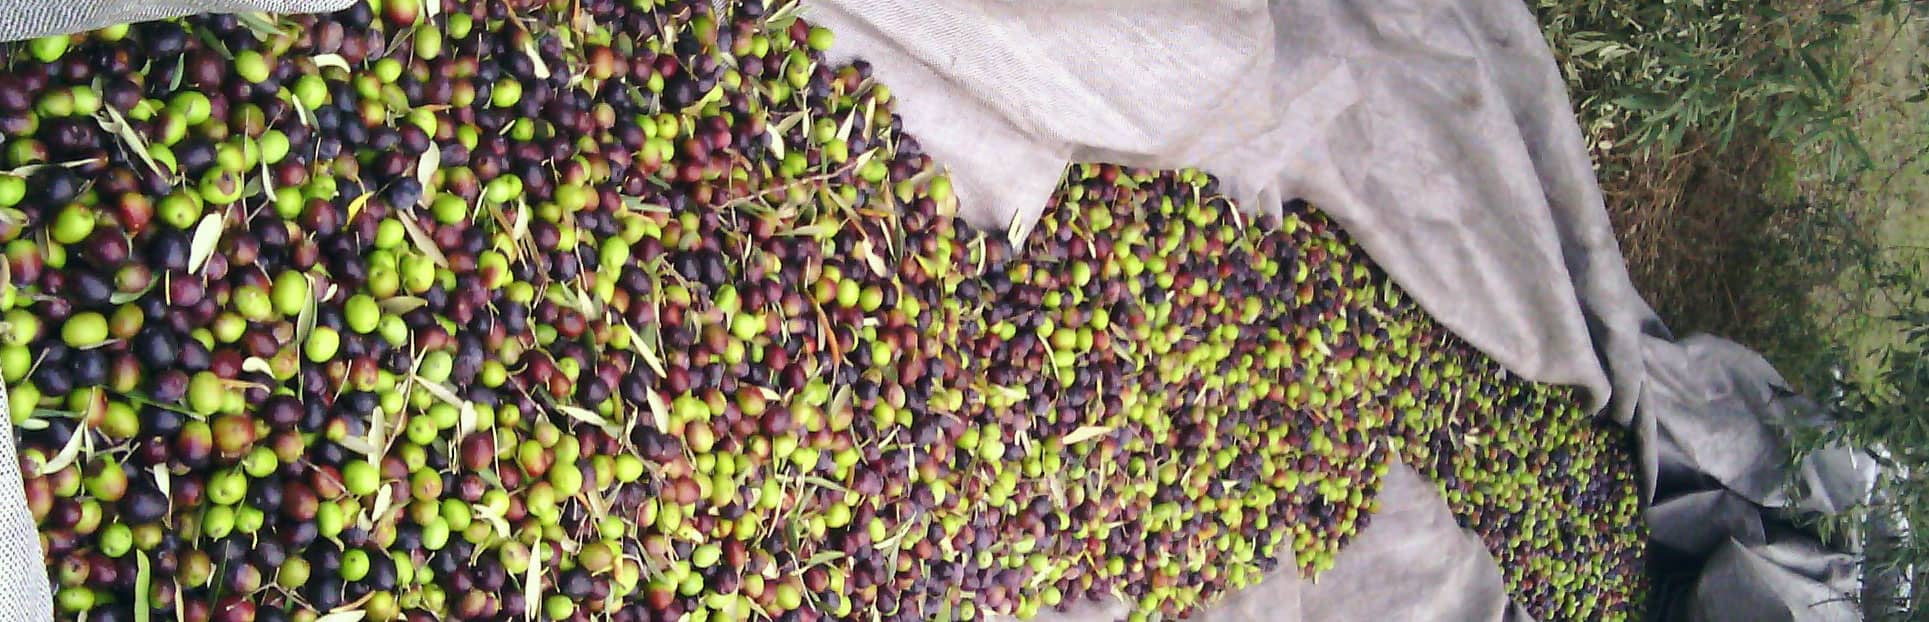 2017 Harvest. Myrolion Greek Organic High Phenolic EVOO. Award-Winning Olive Oil.